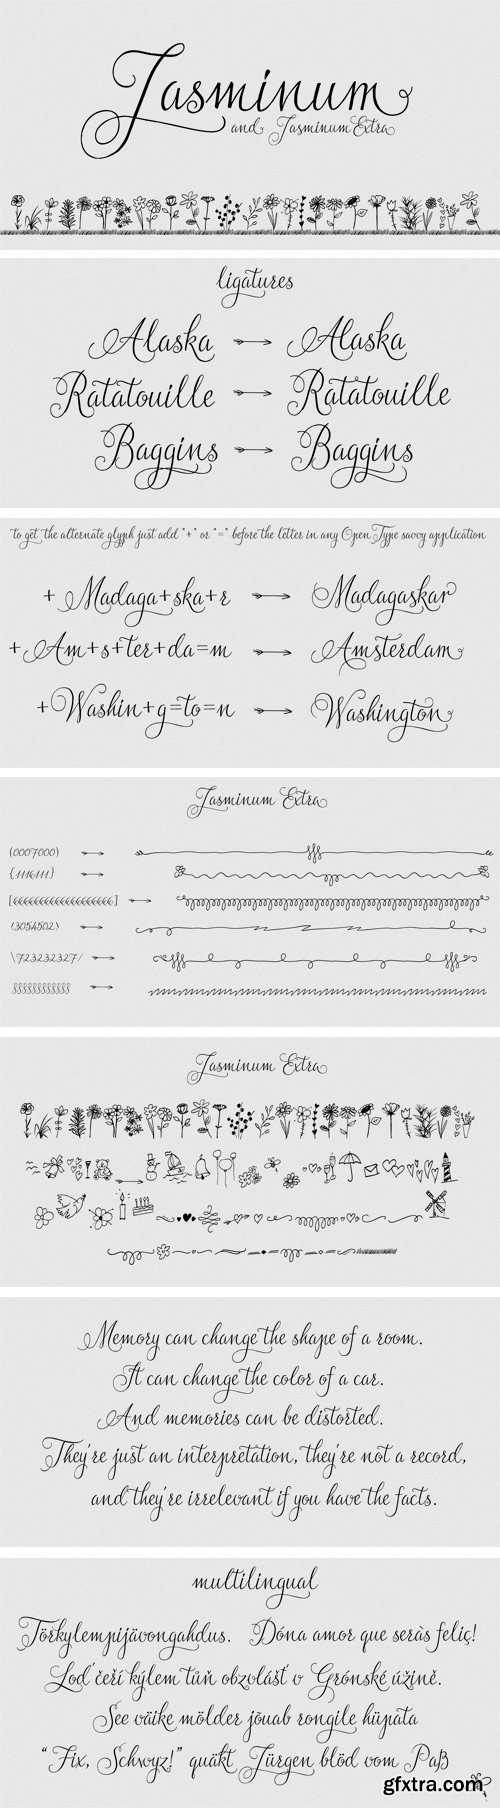 Jasminum Font Family - 2 Fonts for $28